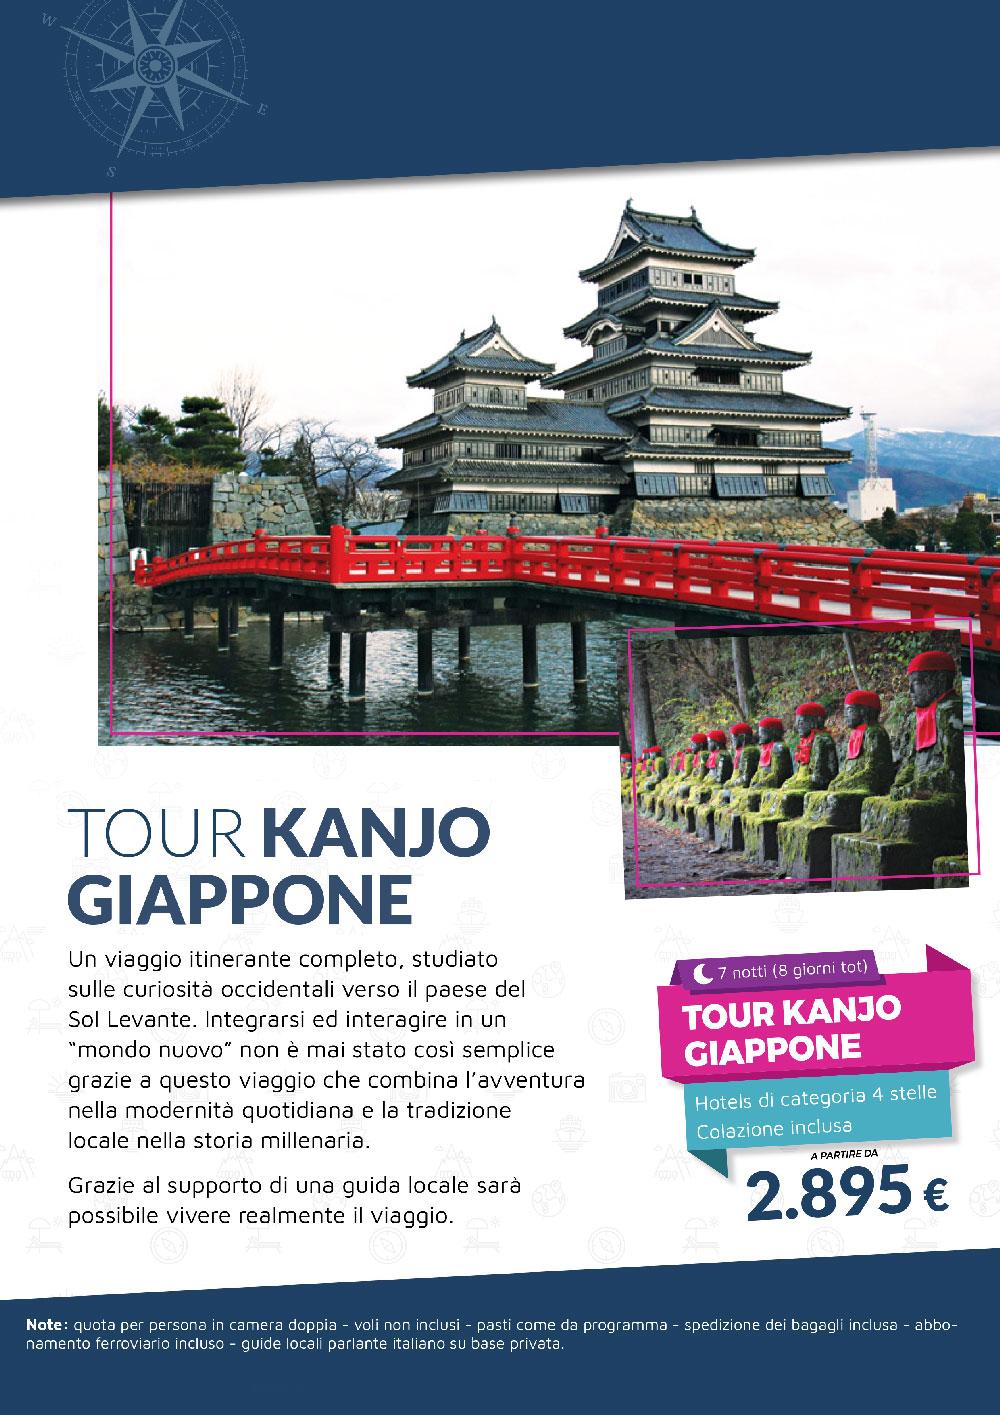 Tour Kanjo Giappone